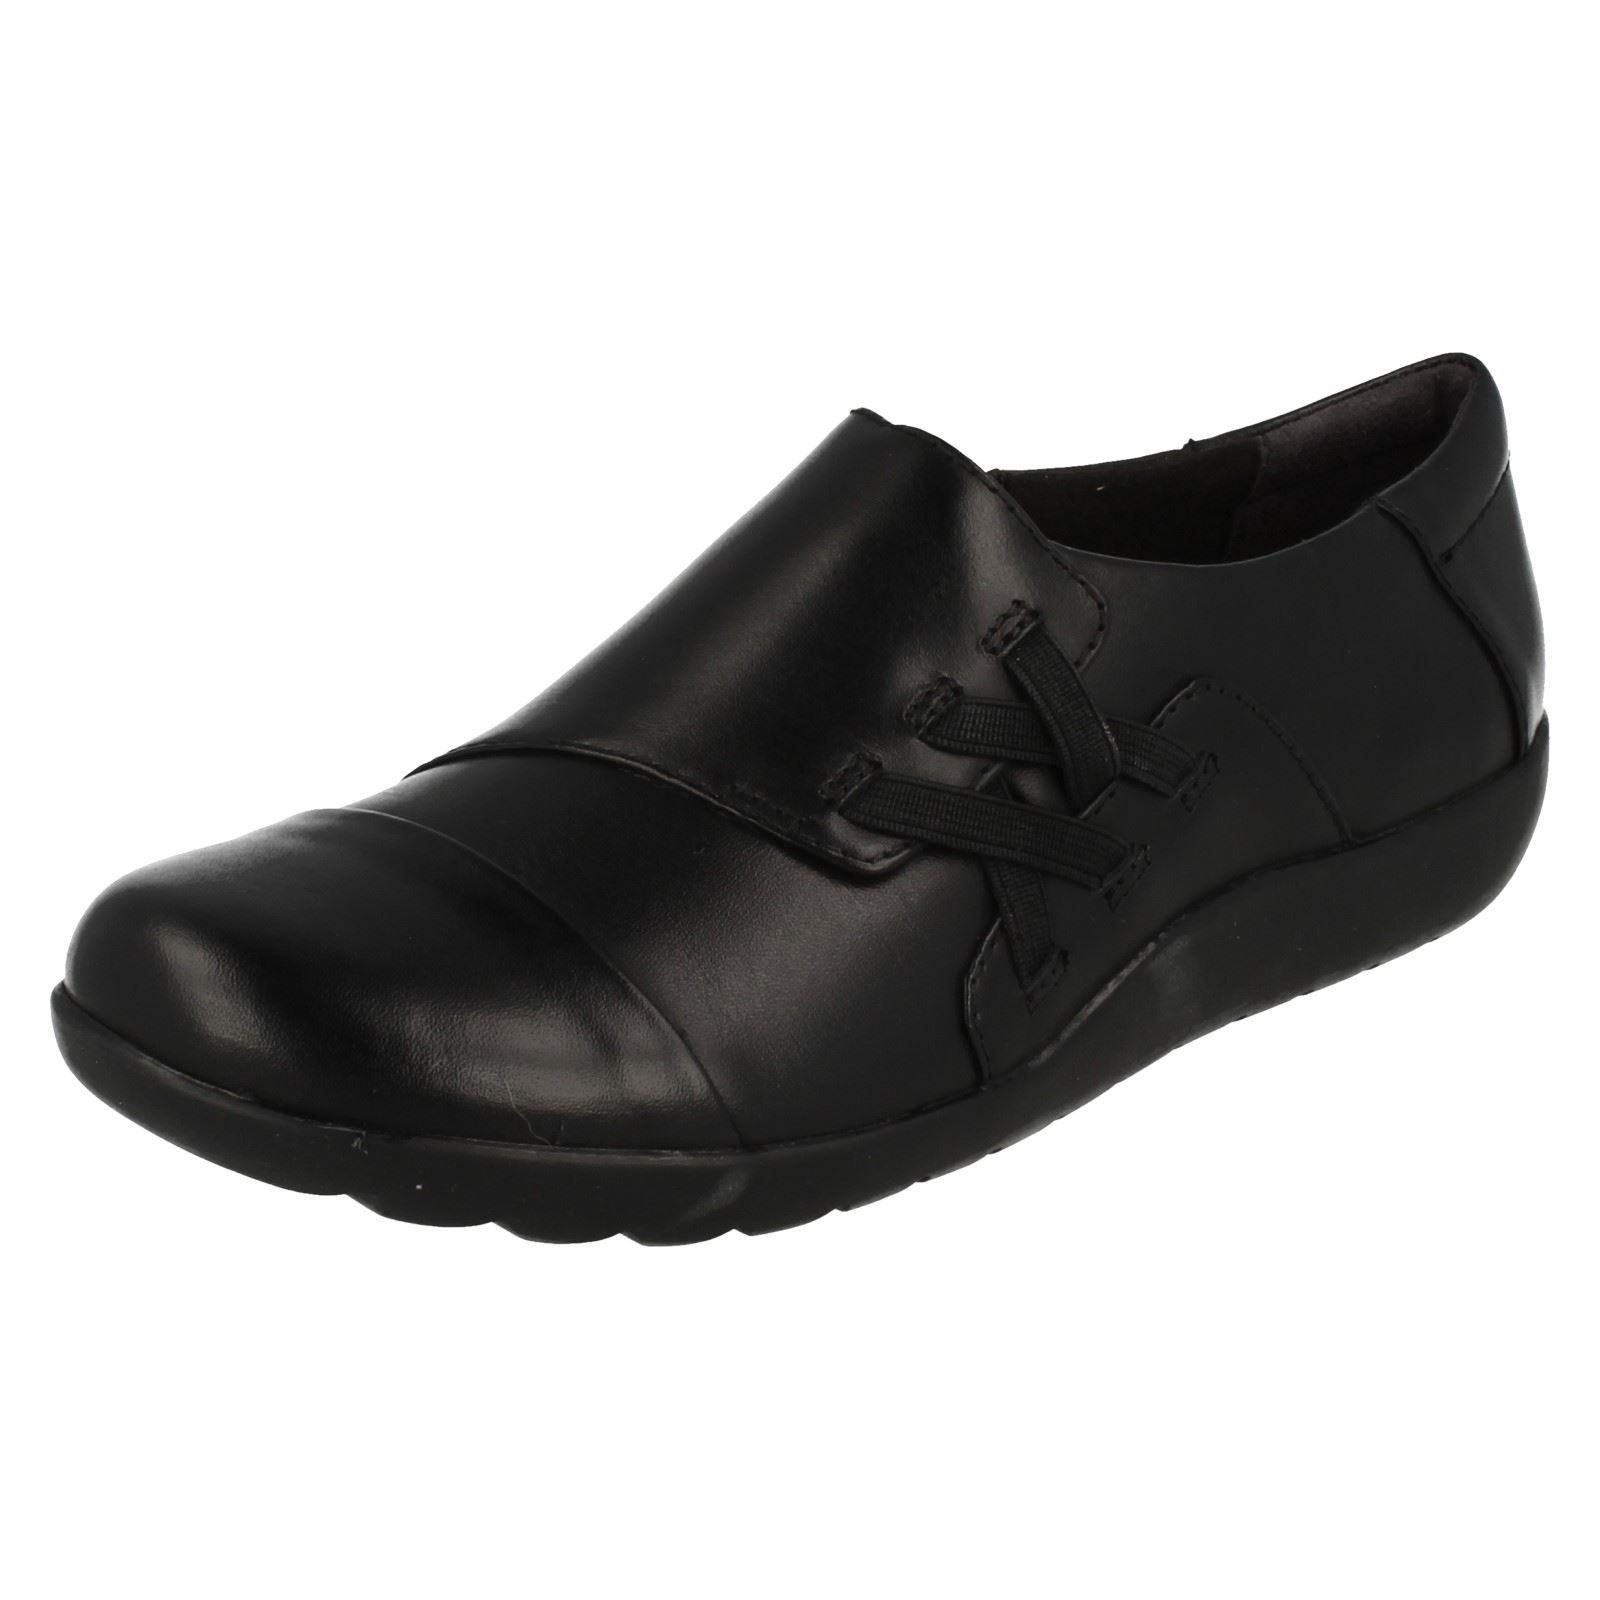 Sandalo Sandy Donna Clarks Scarpe Smart Casual Mocassini Scarpe Clarks Medora   60ad24